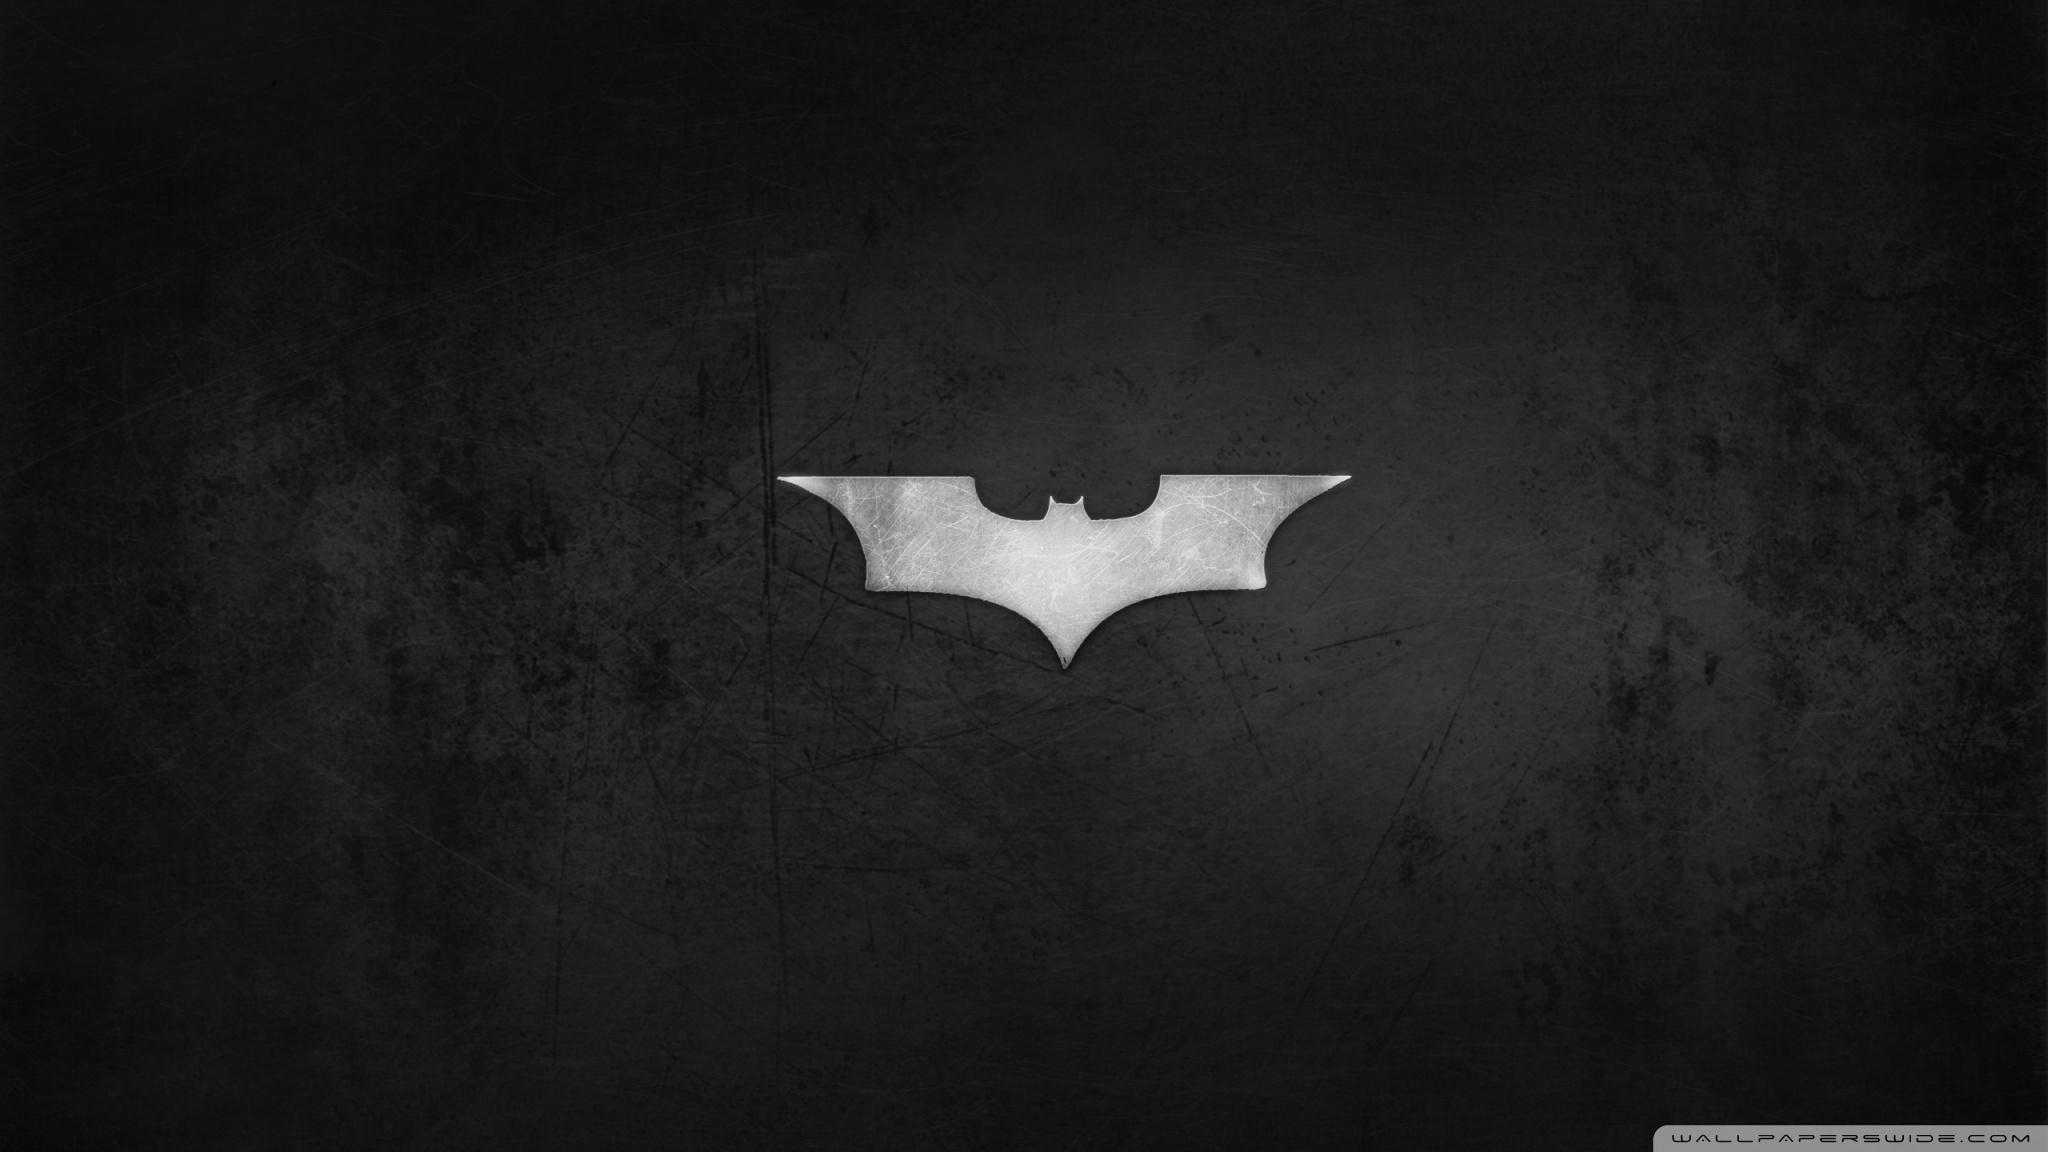 batman logo ❤ 4k hd desktop wallpaper for 4k ultra hd tv • dual